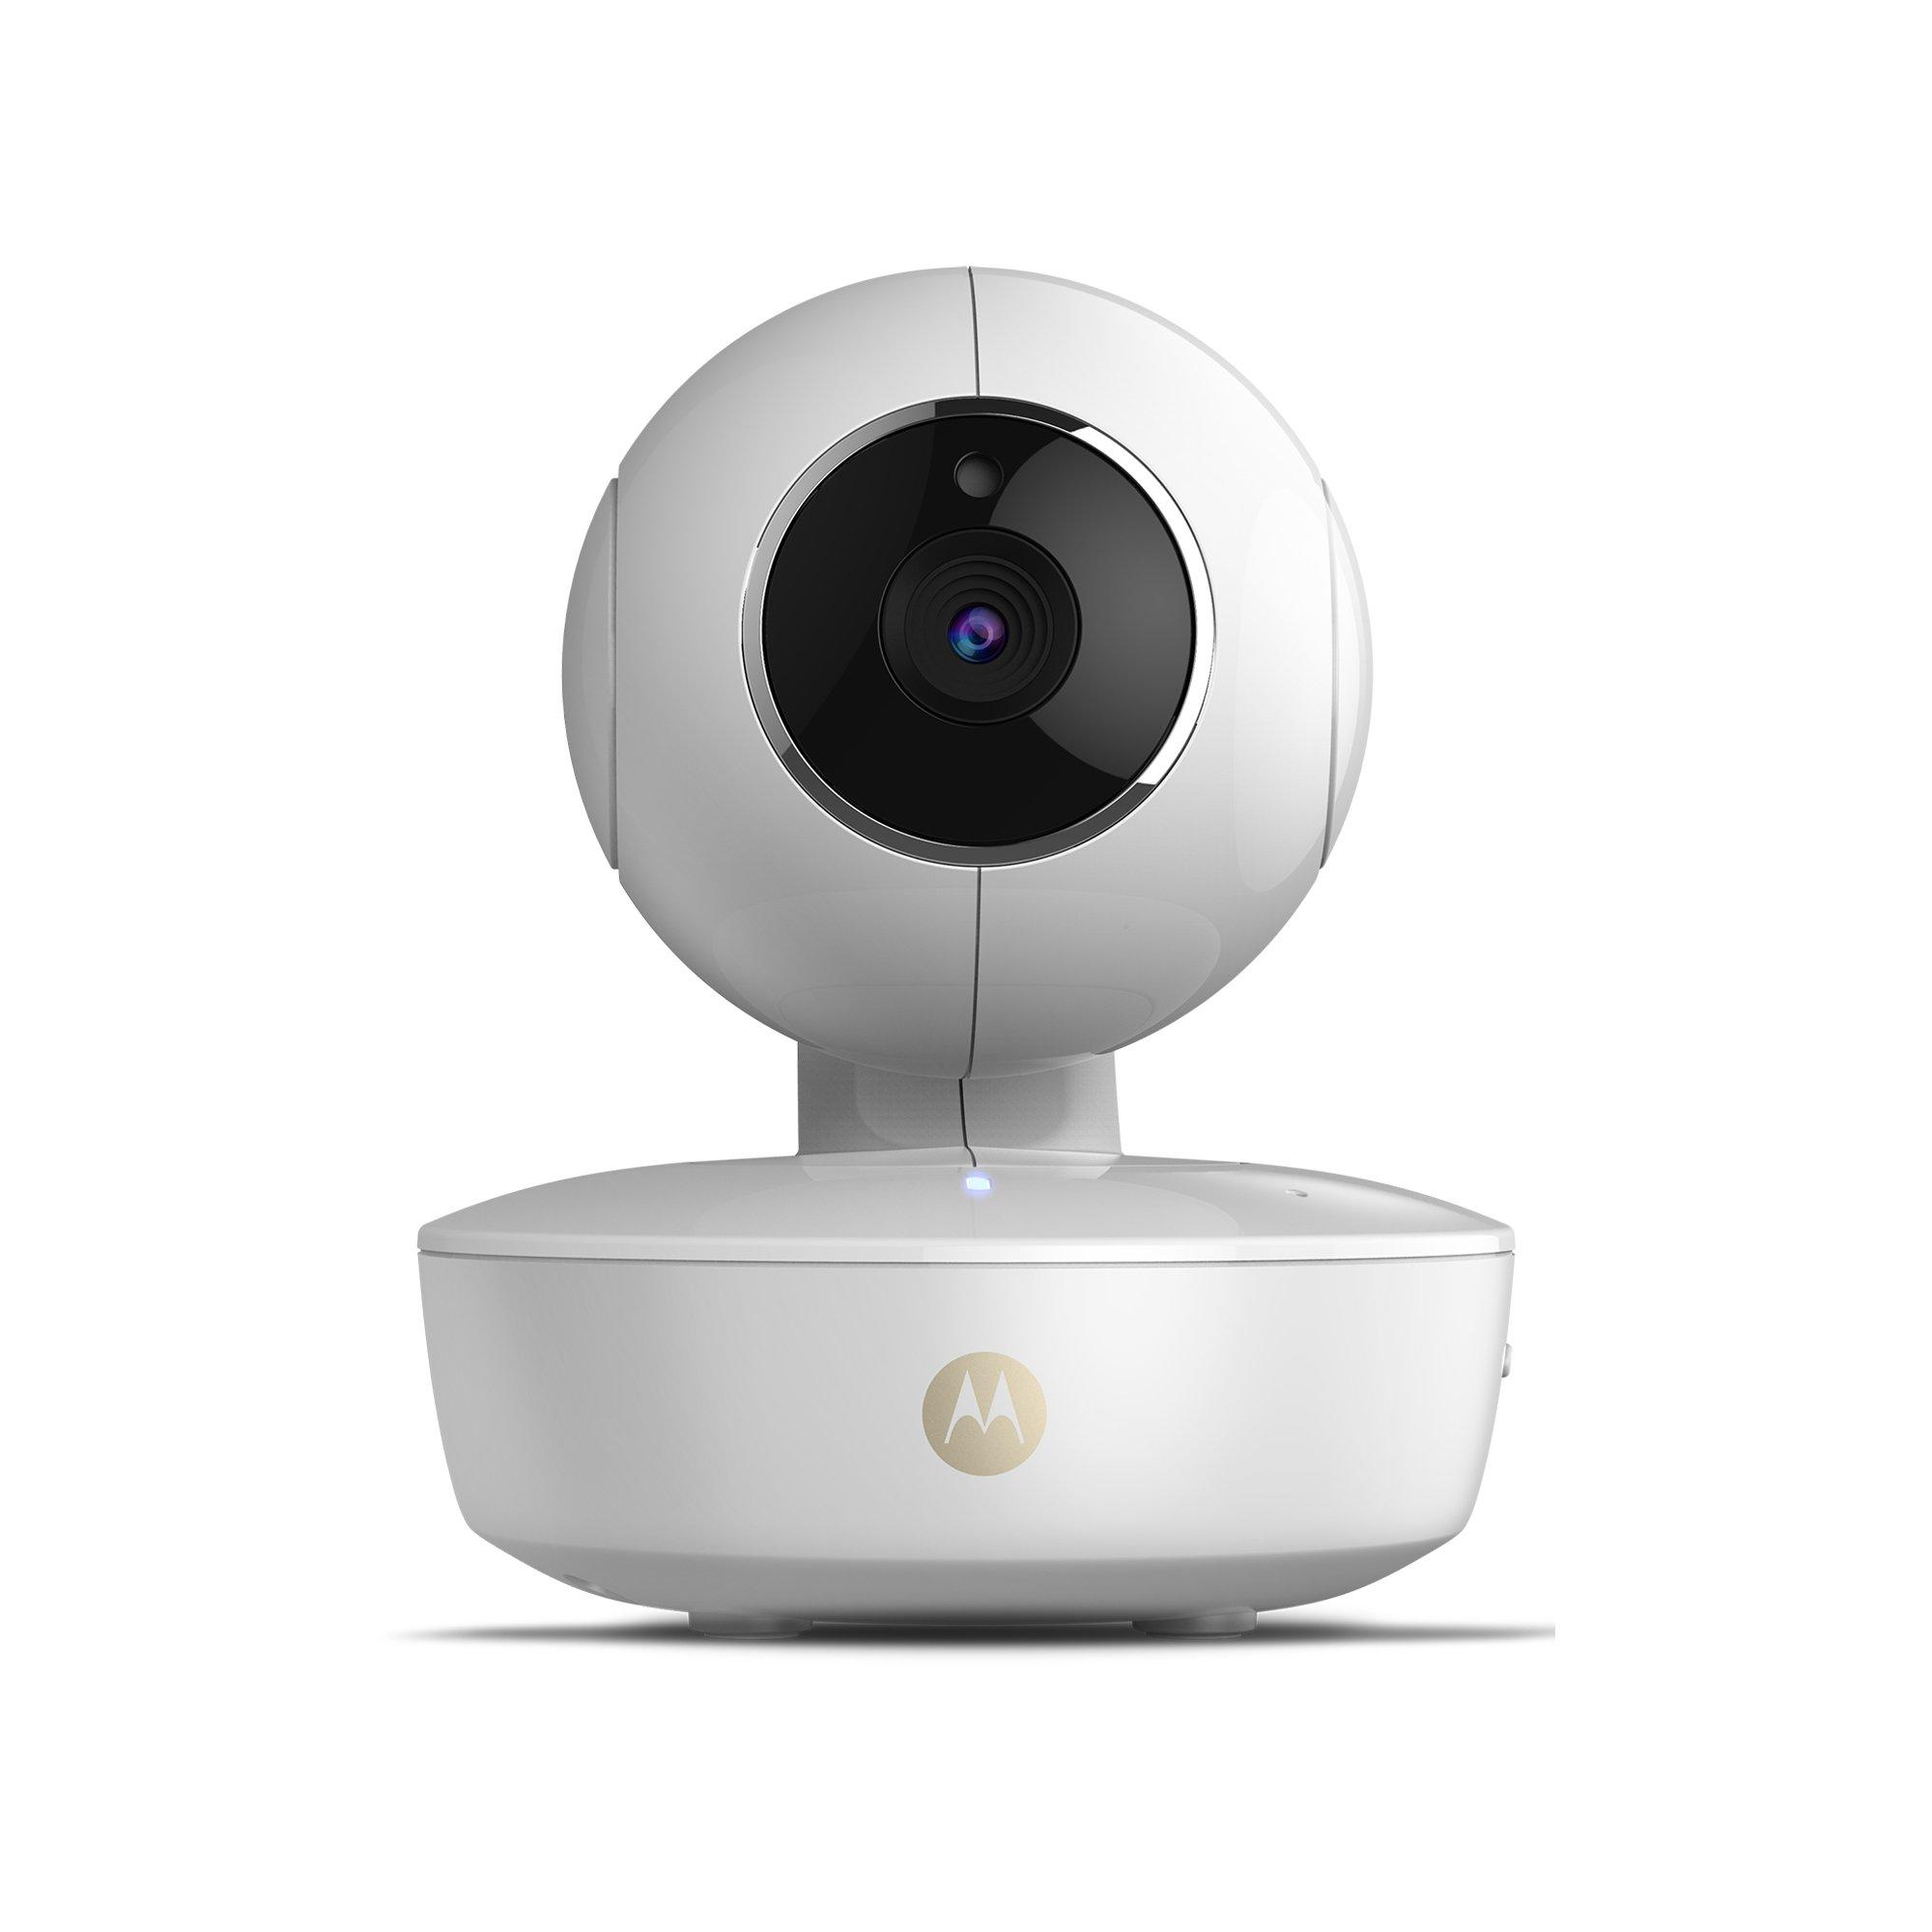 Motorola MBP36XLBU Additional Camera for Motorola MBP36XL and MBP36XL-2 Baby Monitors